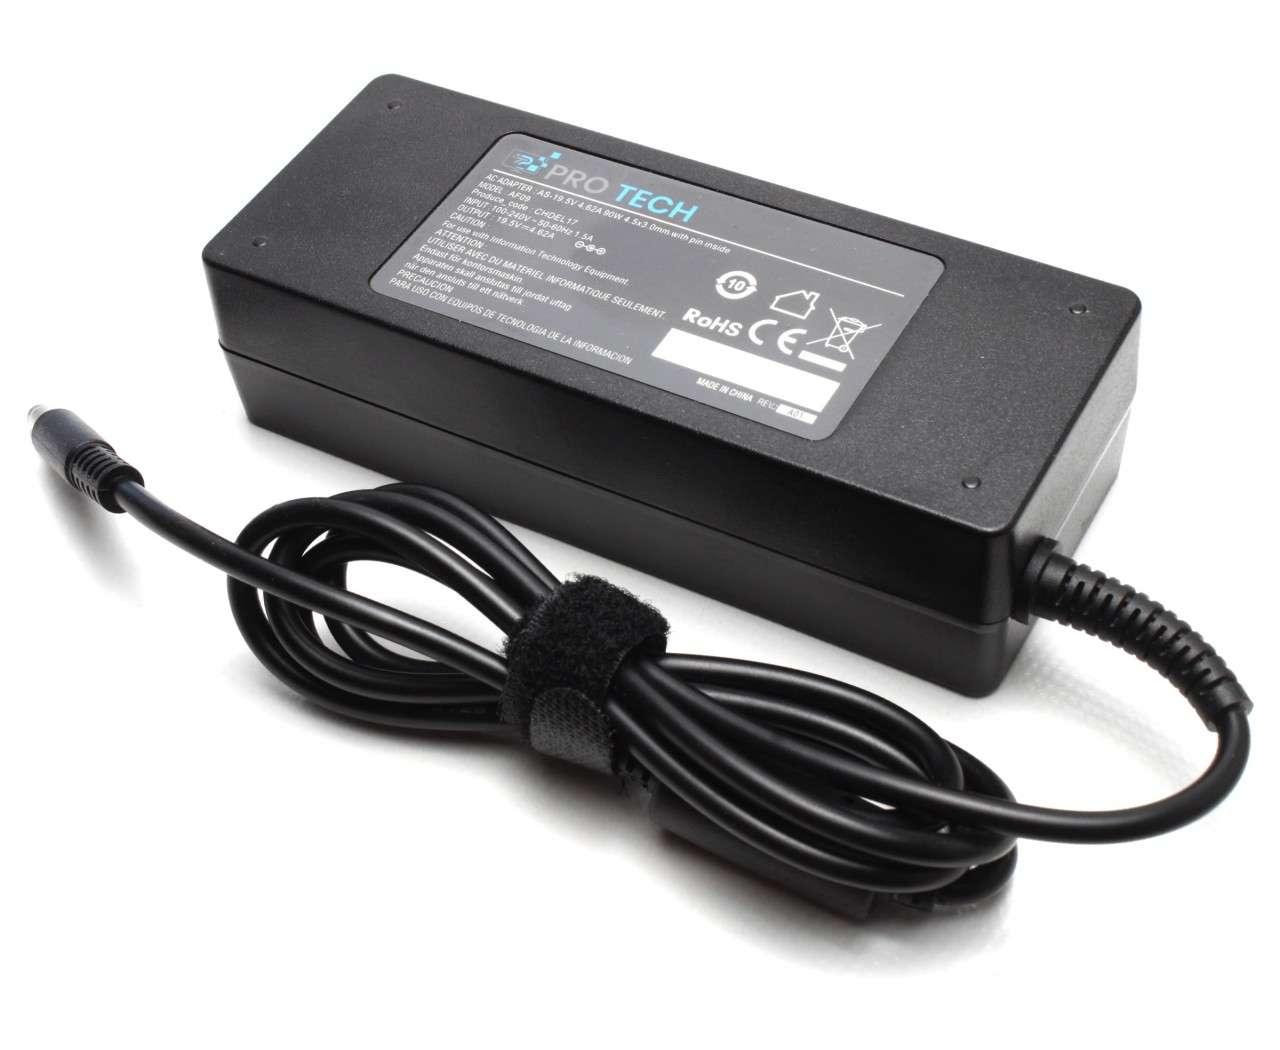 Incarcator Dell OptiPlex 9020 Micro 90W Replacement imagine powerlaptop.ro 2021